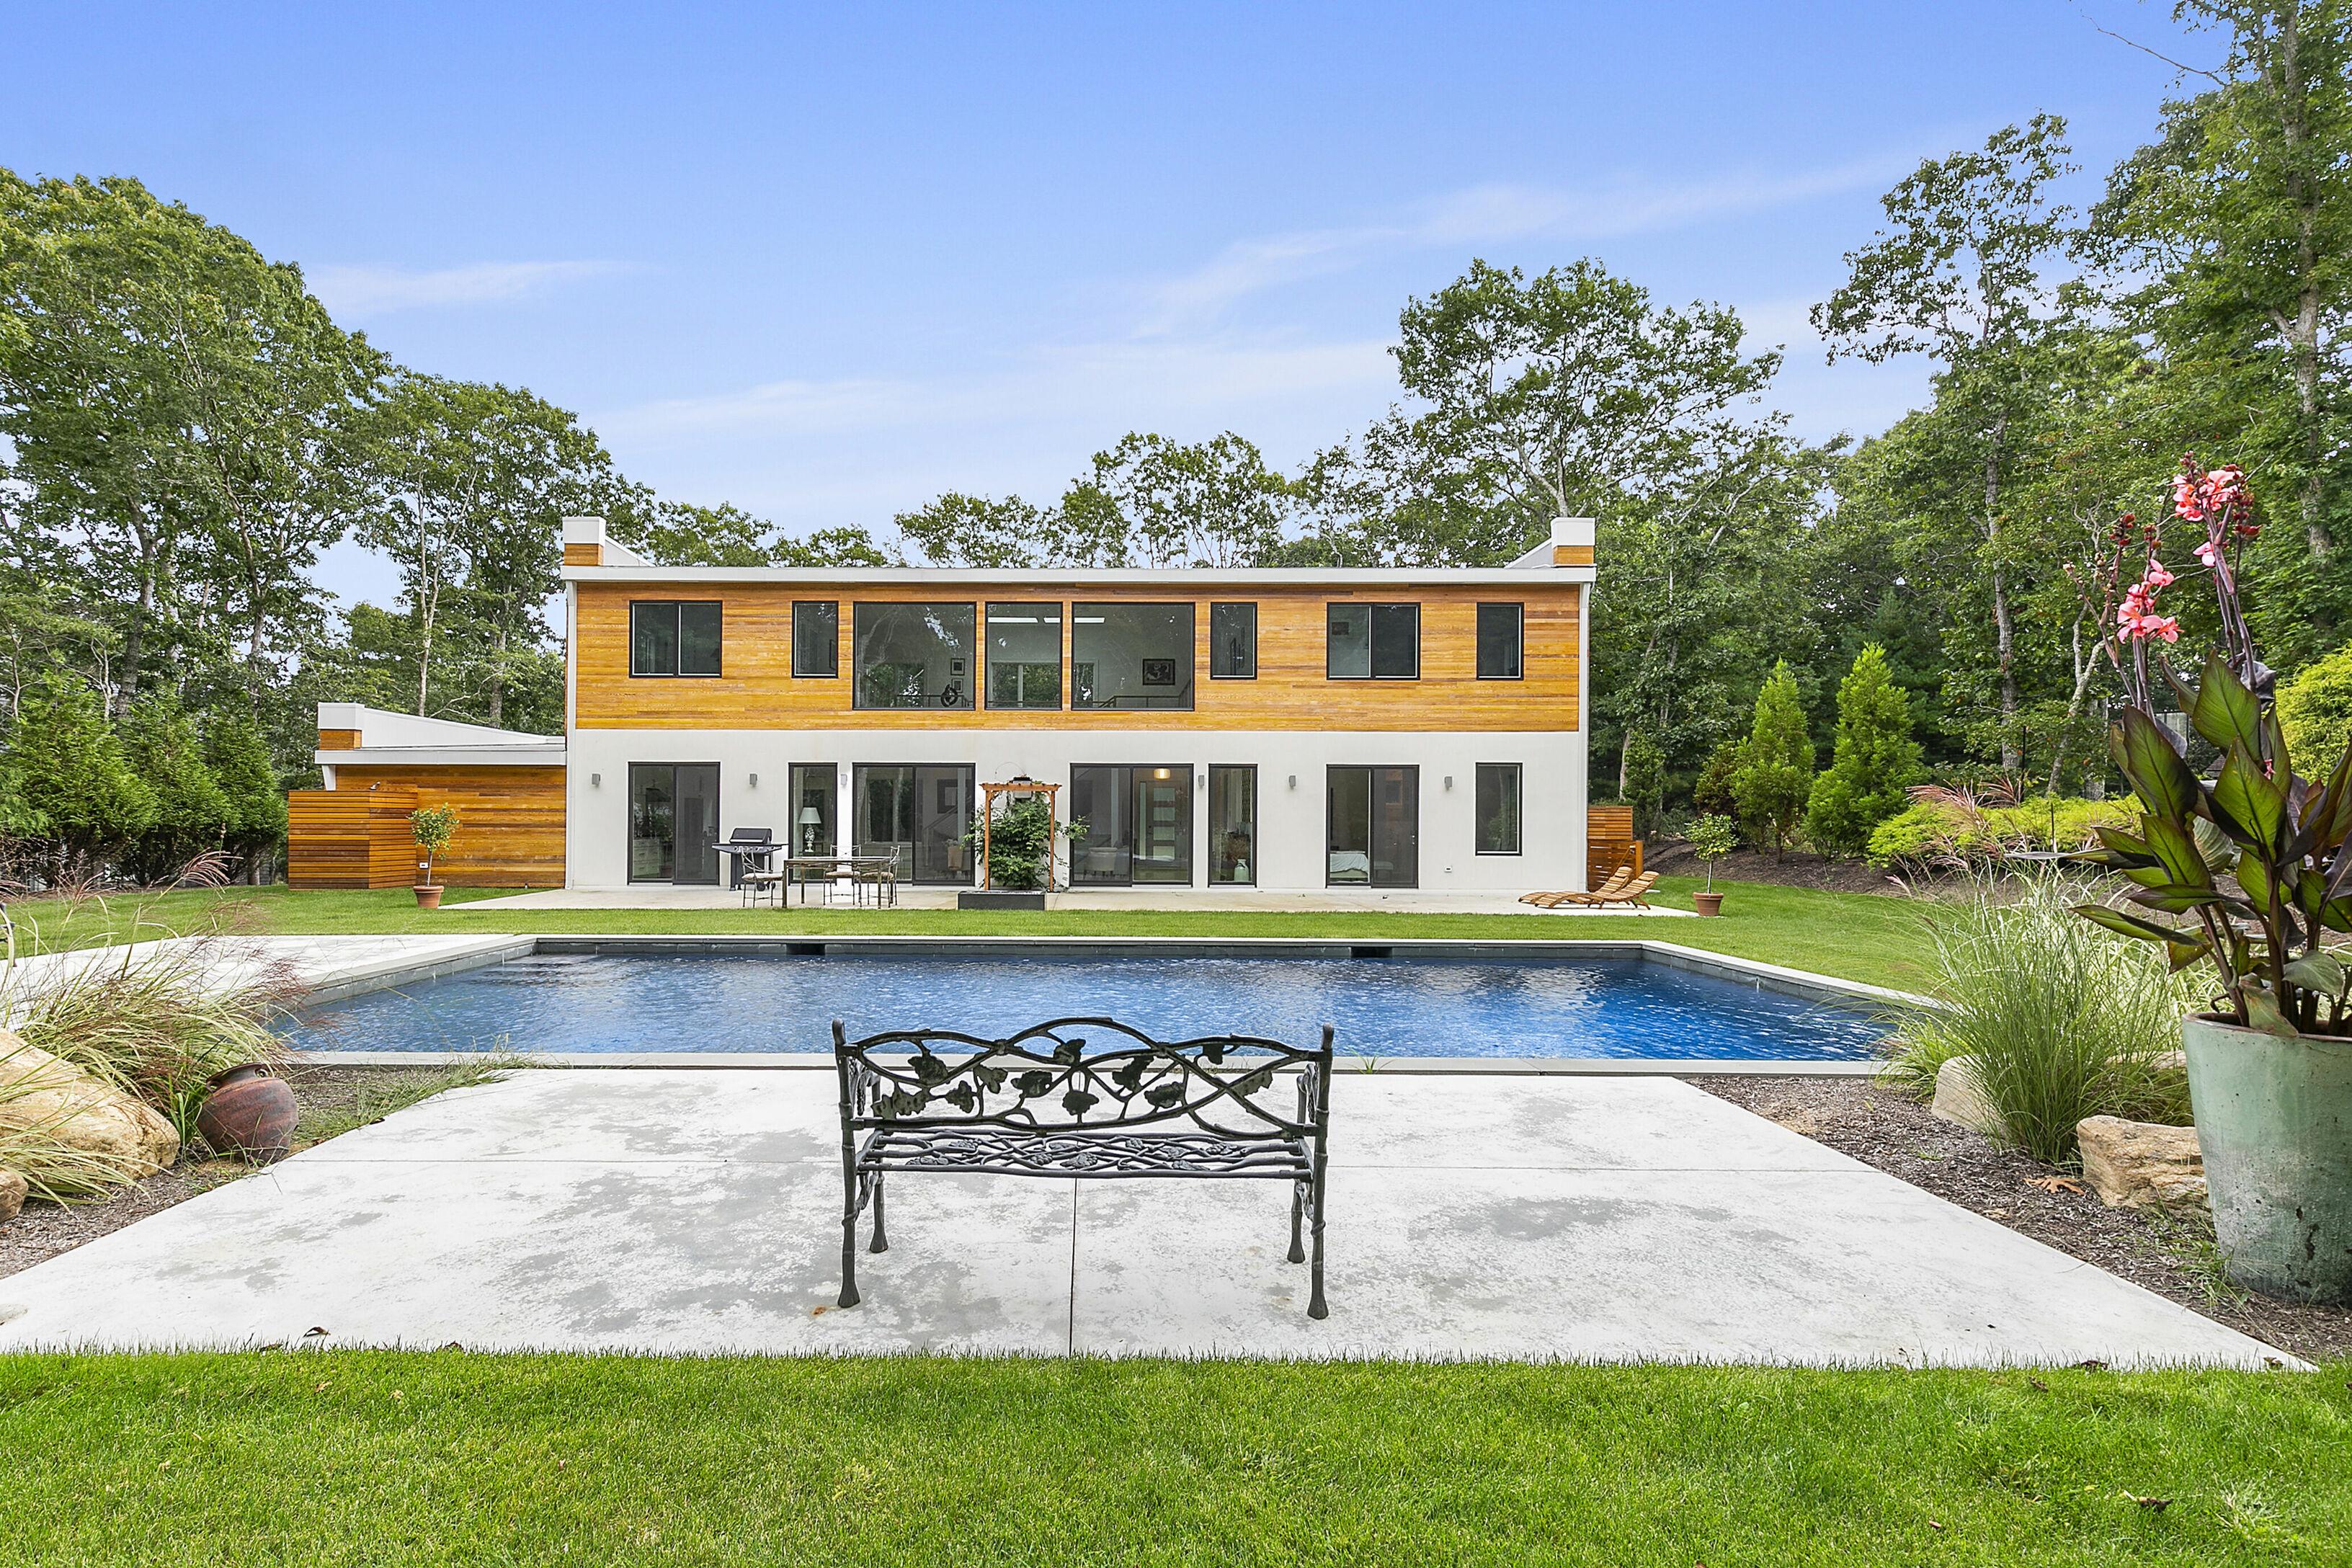 6 Landfall Cir - East Hampton NW, New York